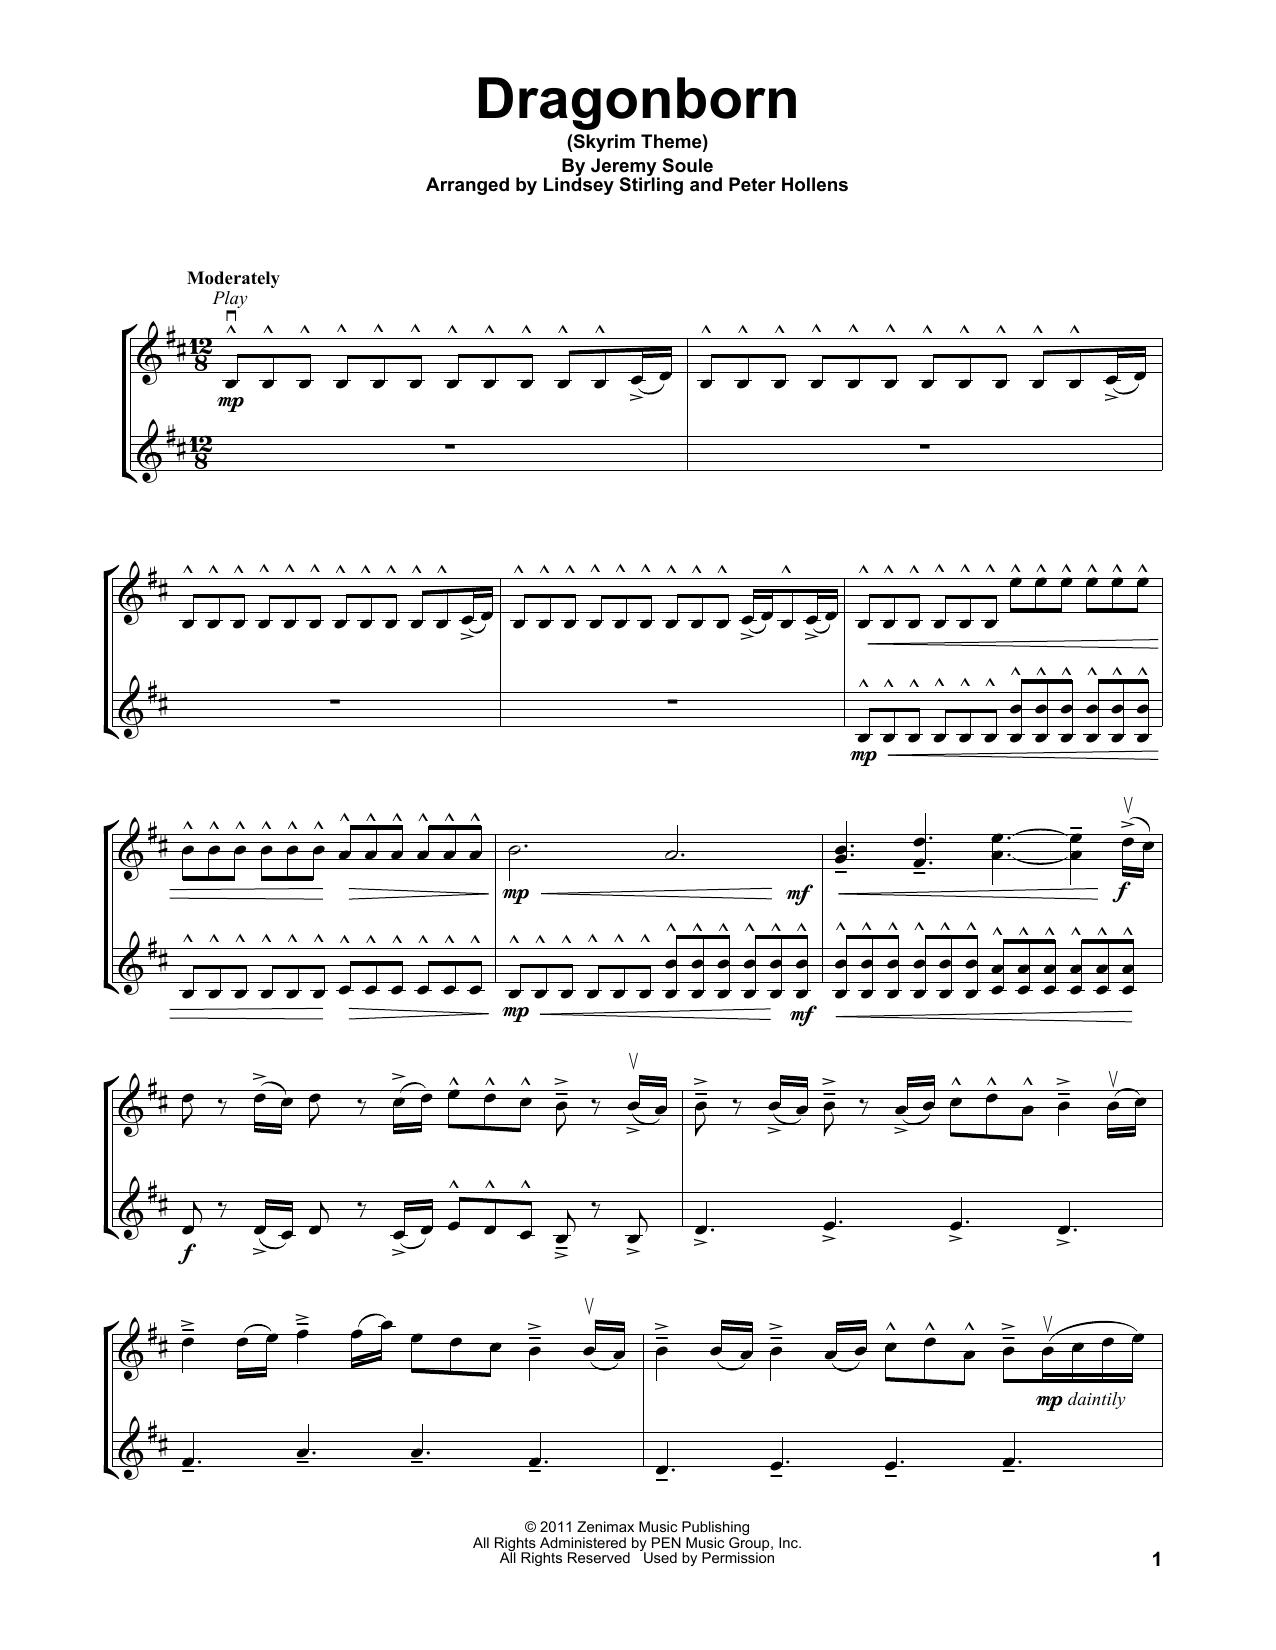 Lindsey Stirling Dragonborn Skyrim Theme Sheet Music Pdf Notes Chords Video Game Score Violin Solo Download Printable Sku 413285